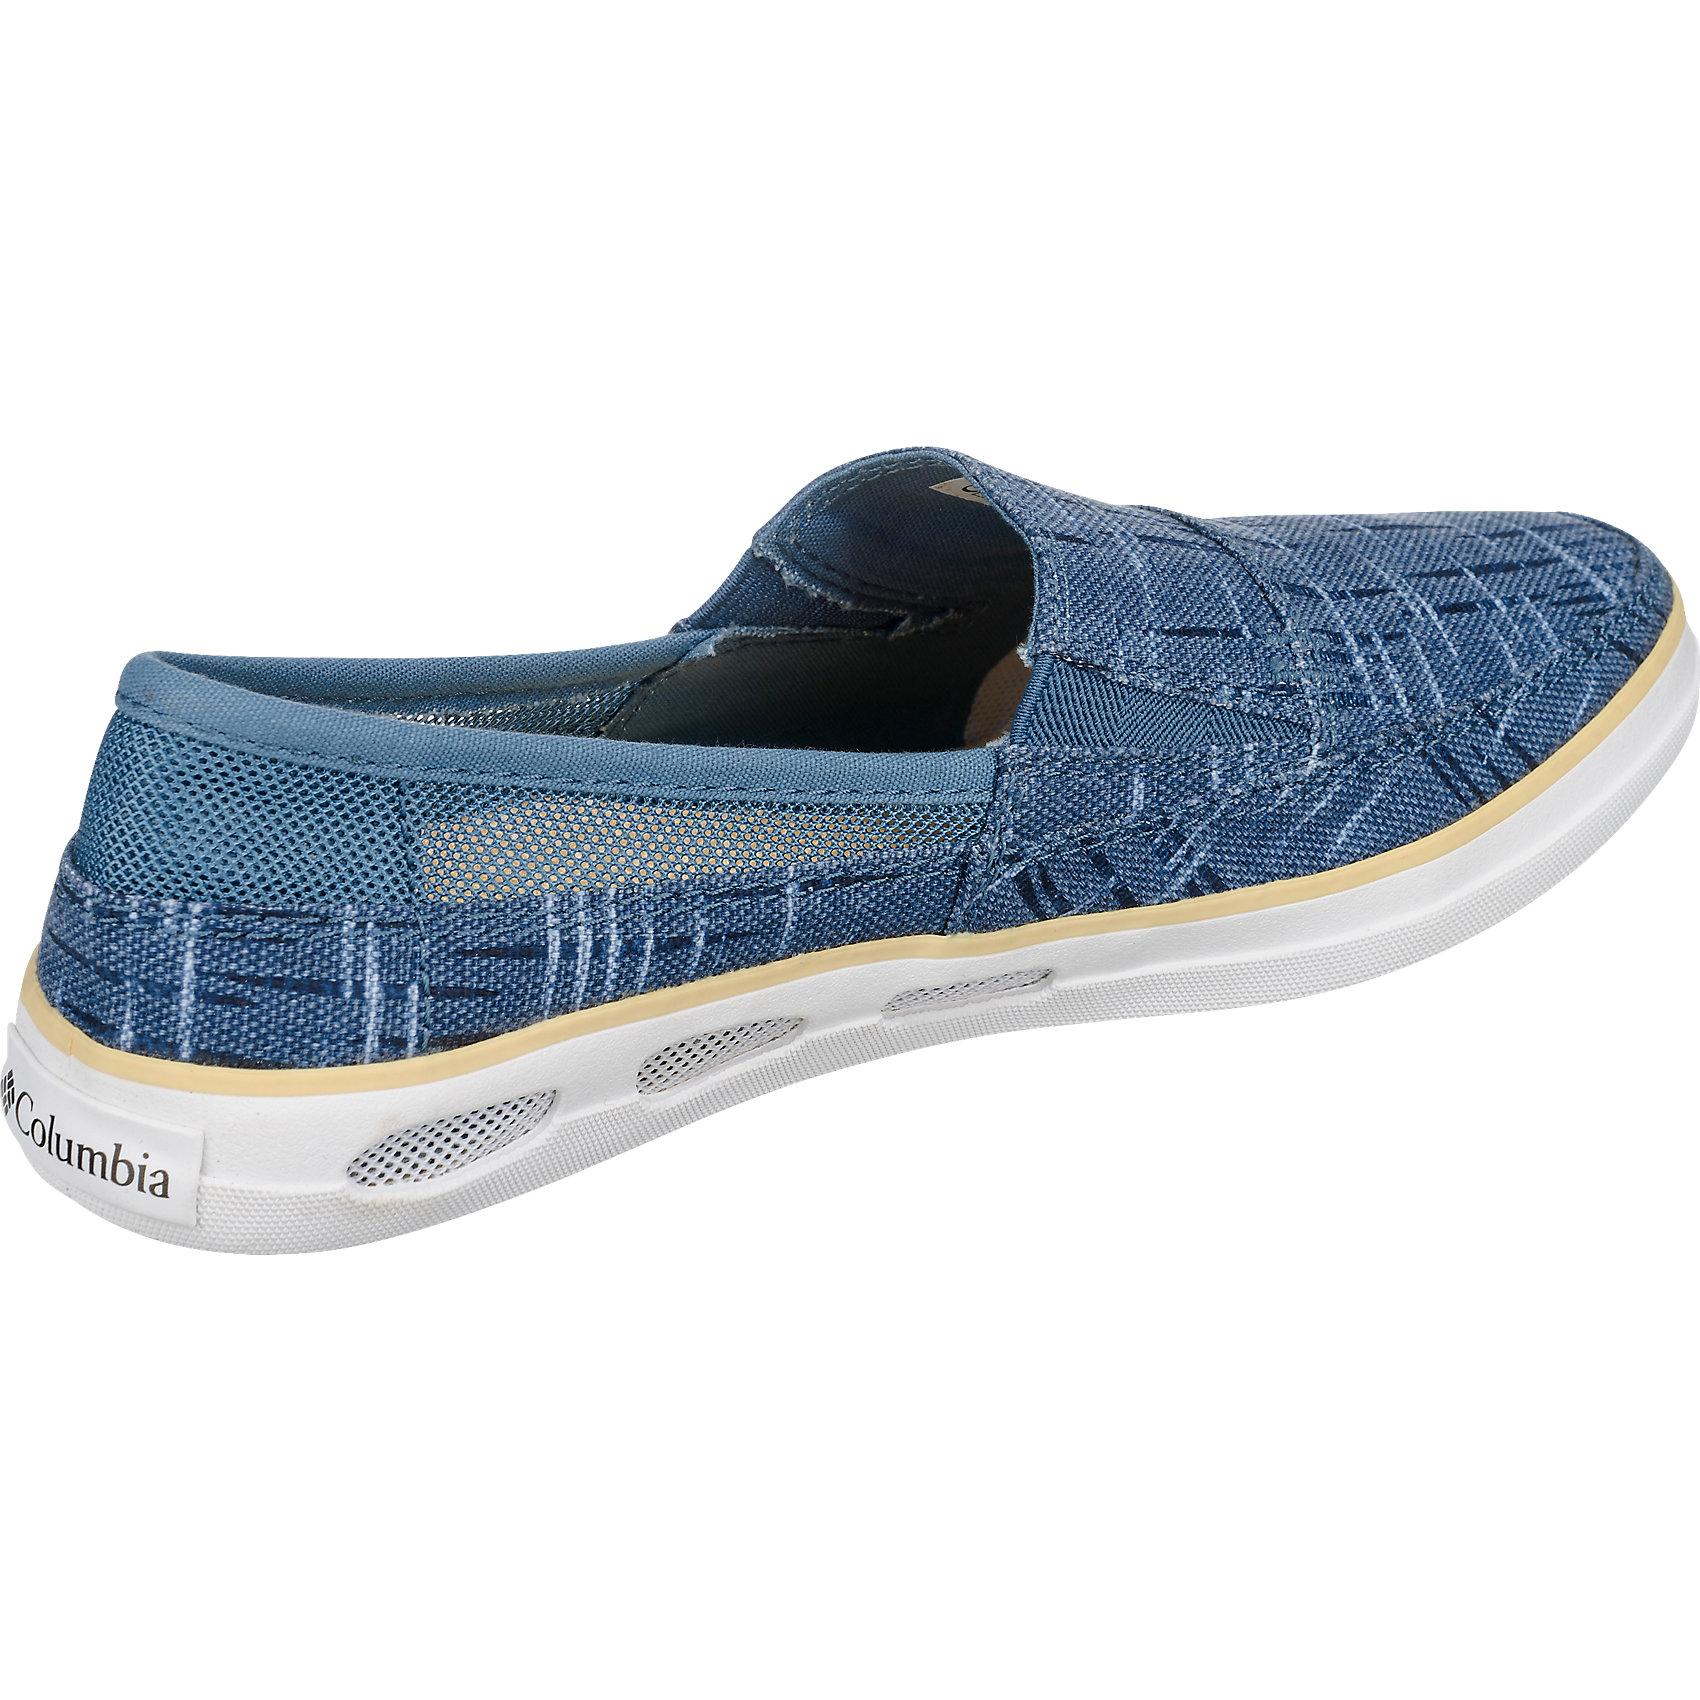 Neu Columbia Vulc blau N Vent Slip Outdoor Slipper schwarz blau Vulc 5766380 3a6448